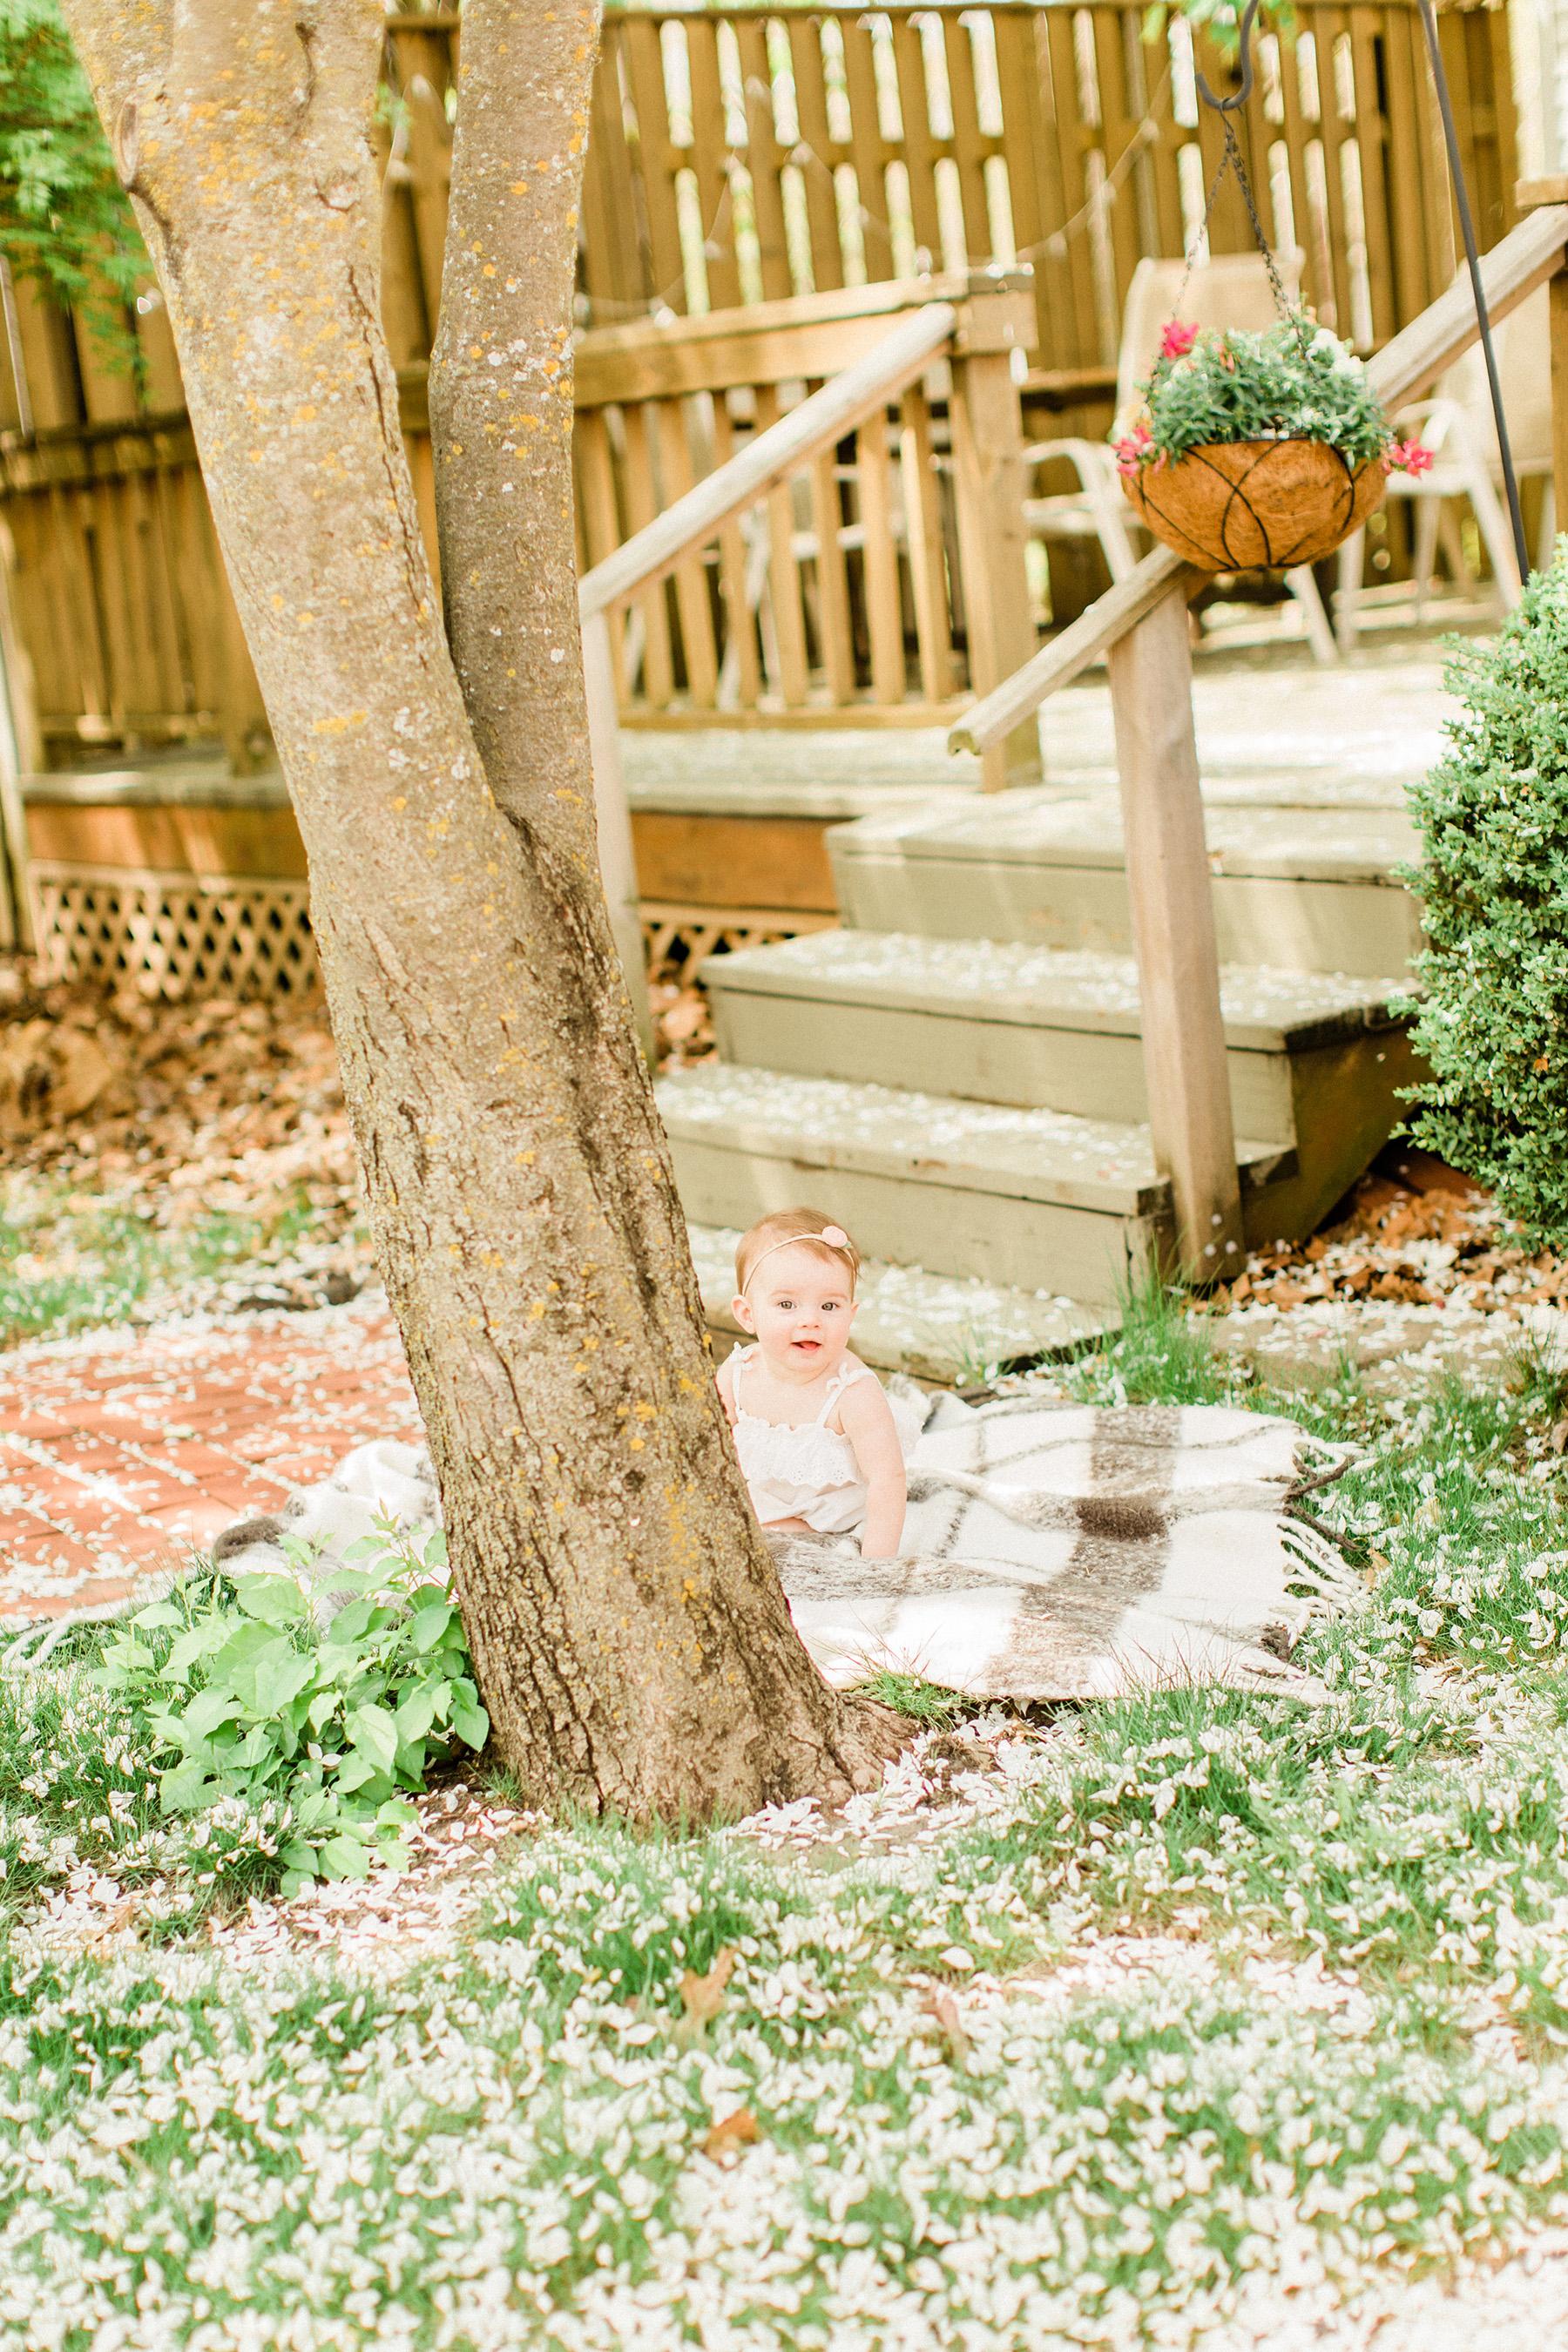 BabyBlooms-45.jpg